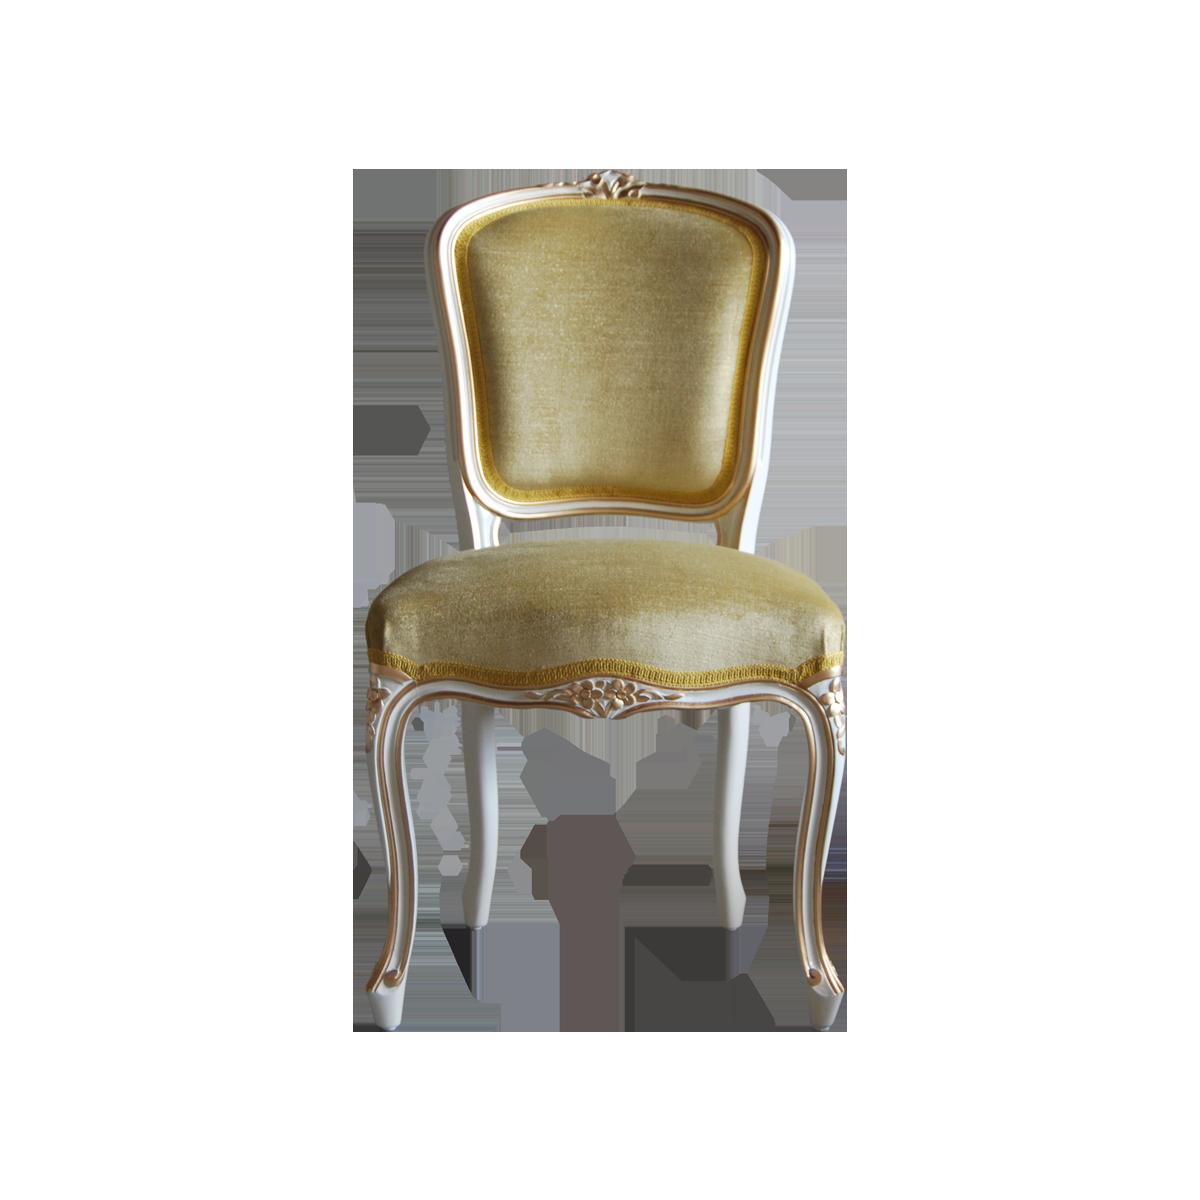 Chaise Salle A Manger Louis Xv chaise louis xv 145 - pierre counot blandin